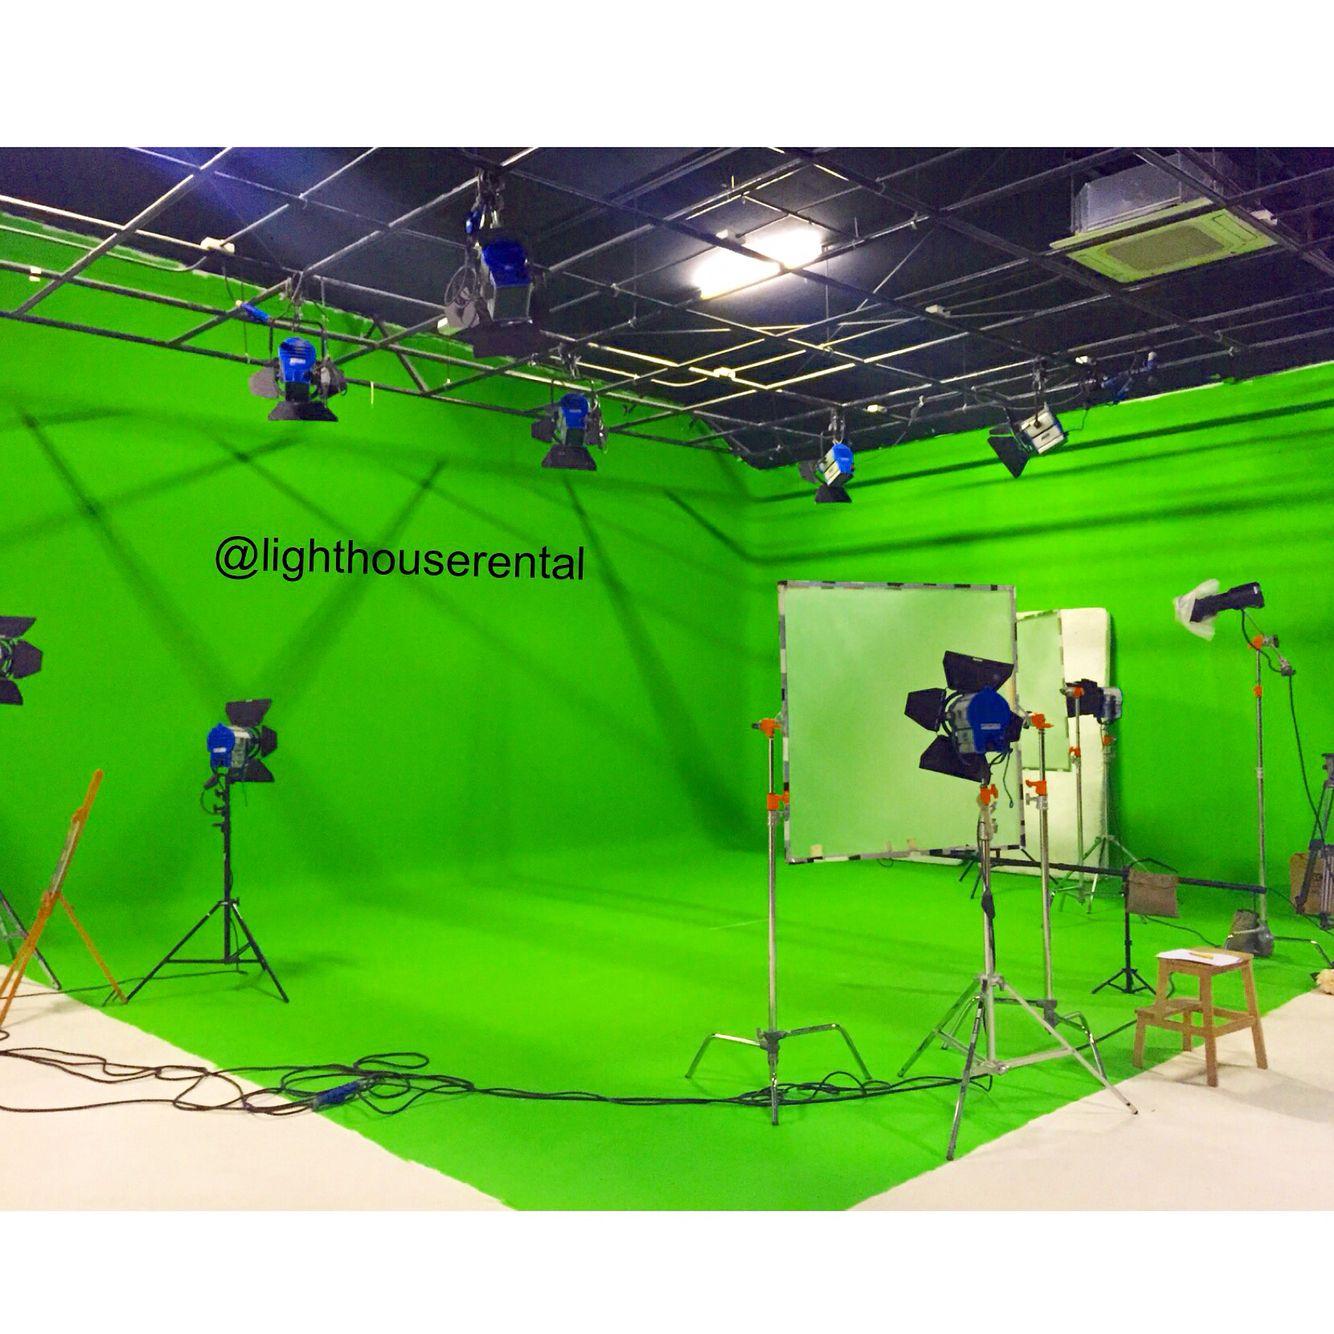 We have a sound proof film chroma studio in Dubai for hire